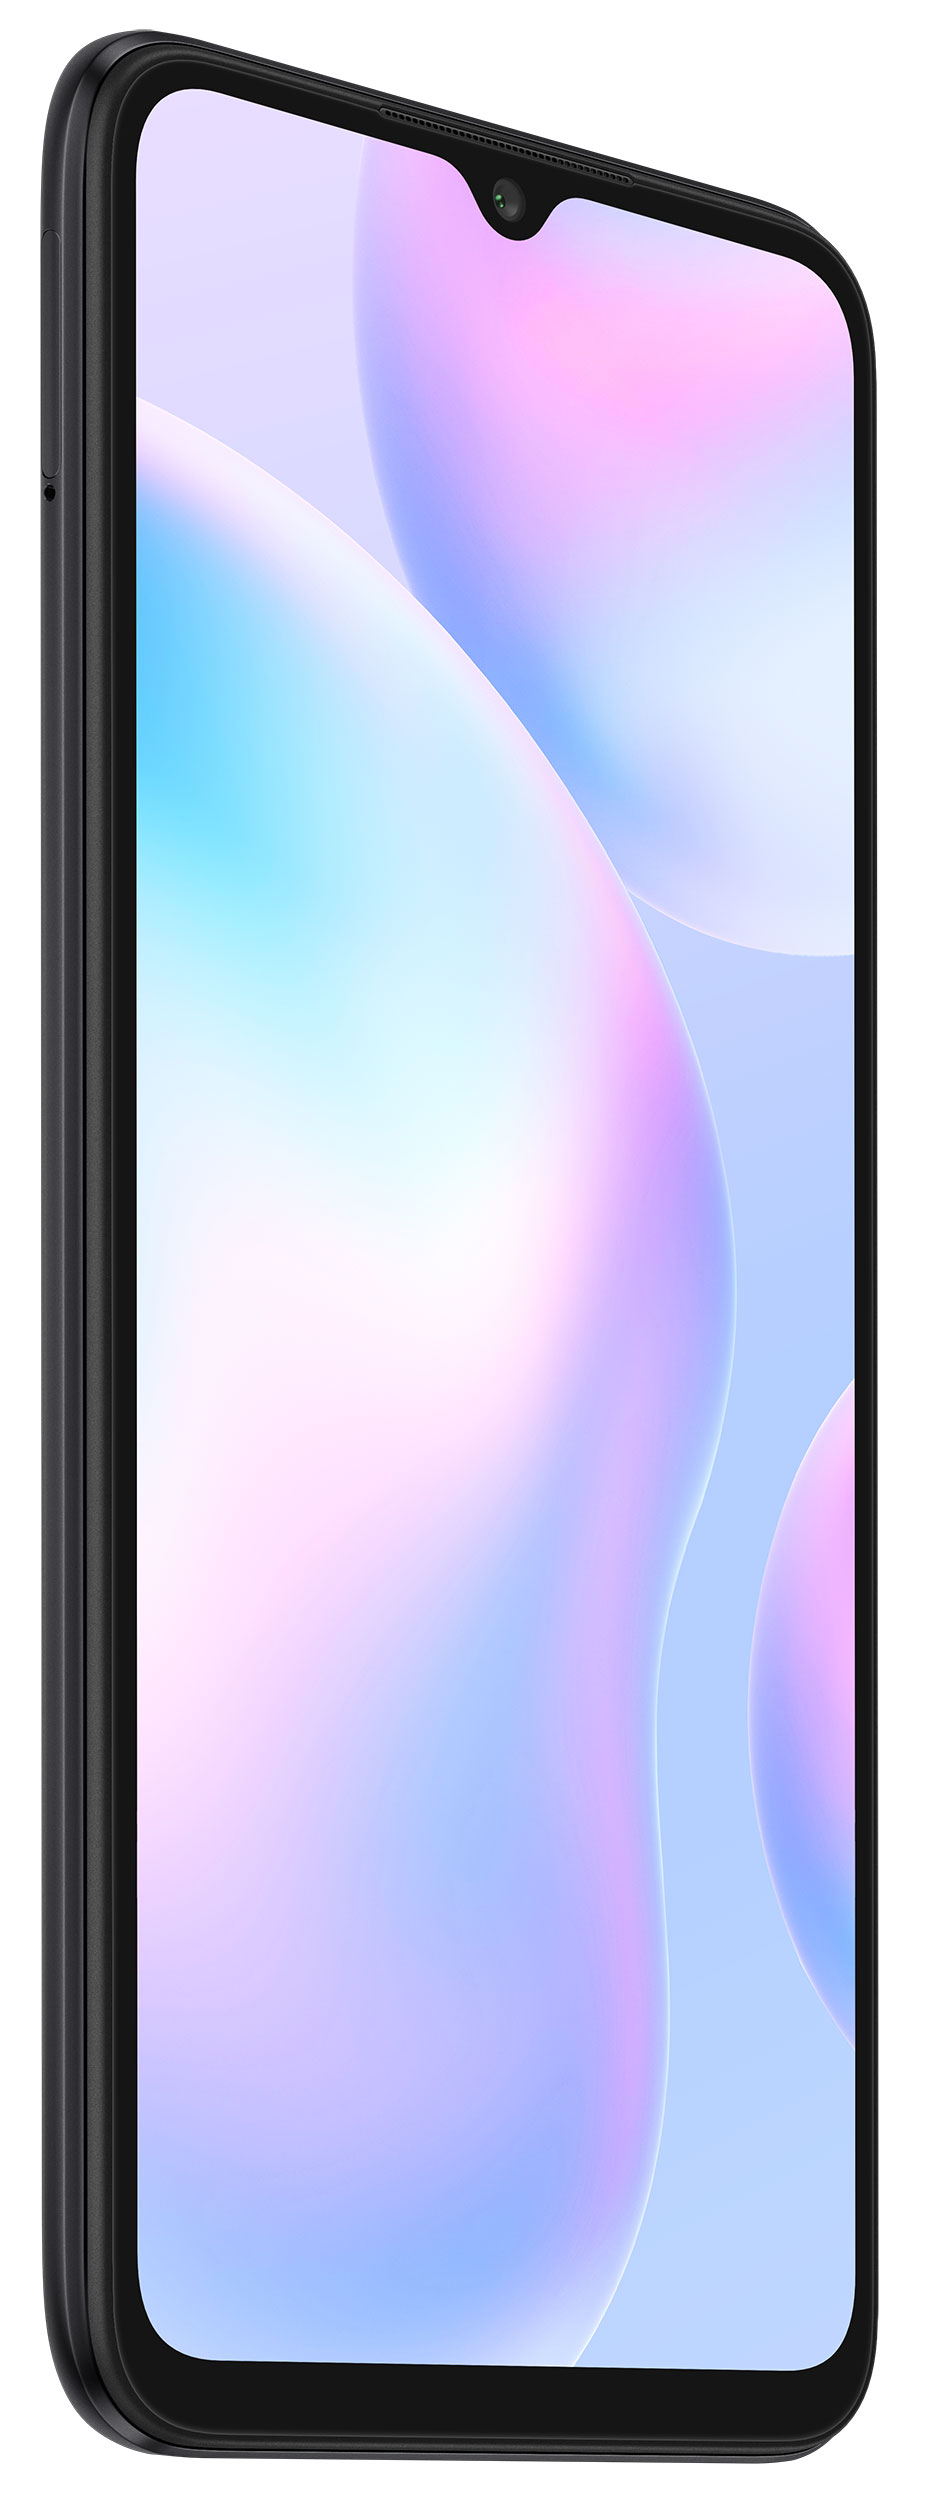 Redmi 9A okostelefon (Global) - 2+32GB, Granite Gray